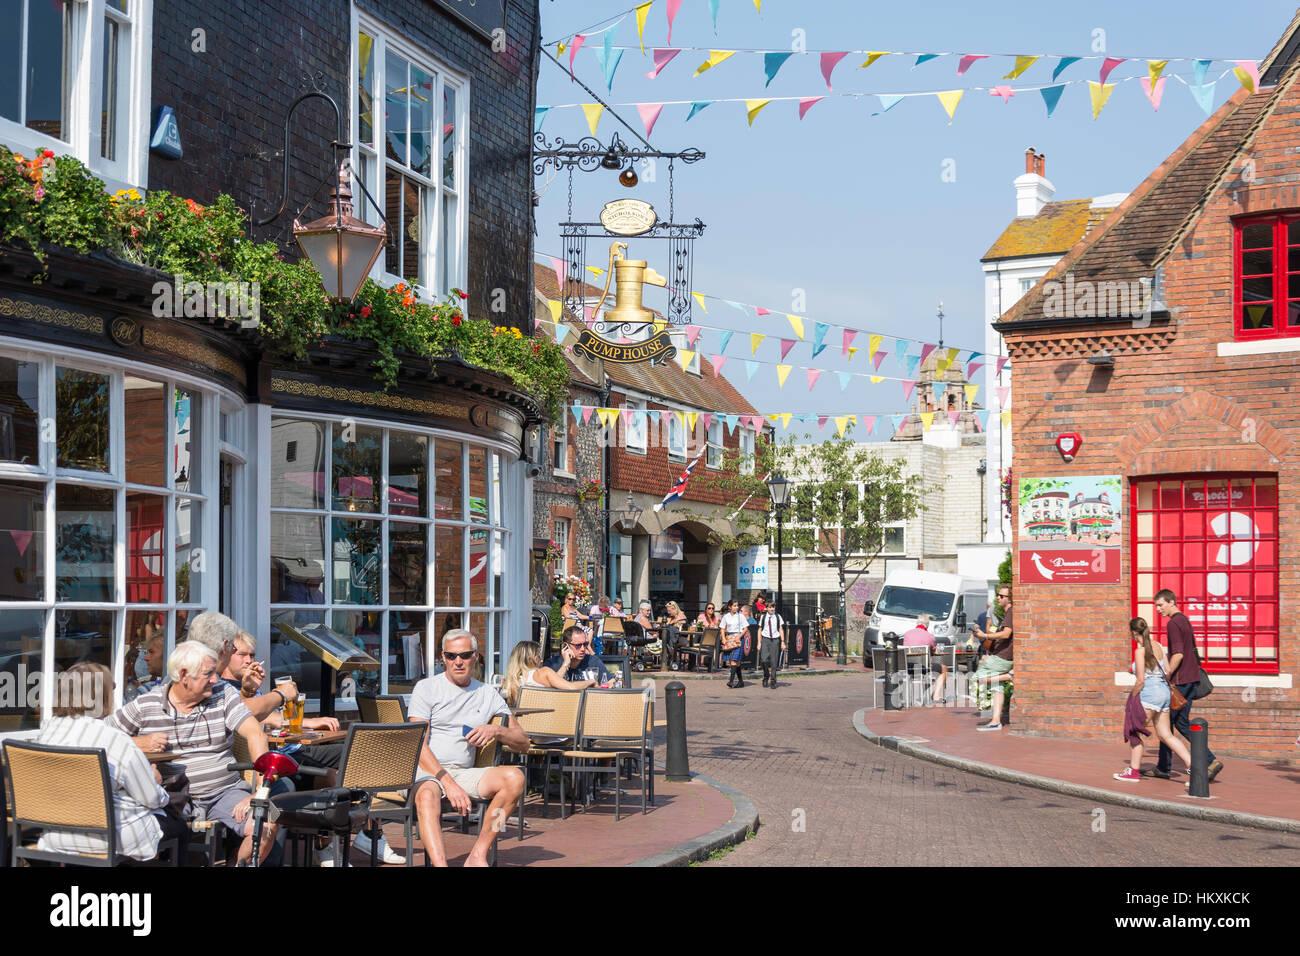 18th century Pump House Pub, Market Street, The Lanes, Brighton, East Sussex, England, United Kingdom - Stock Image